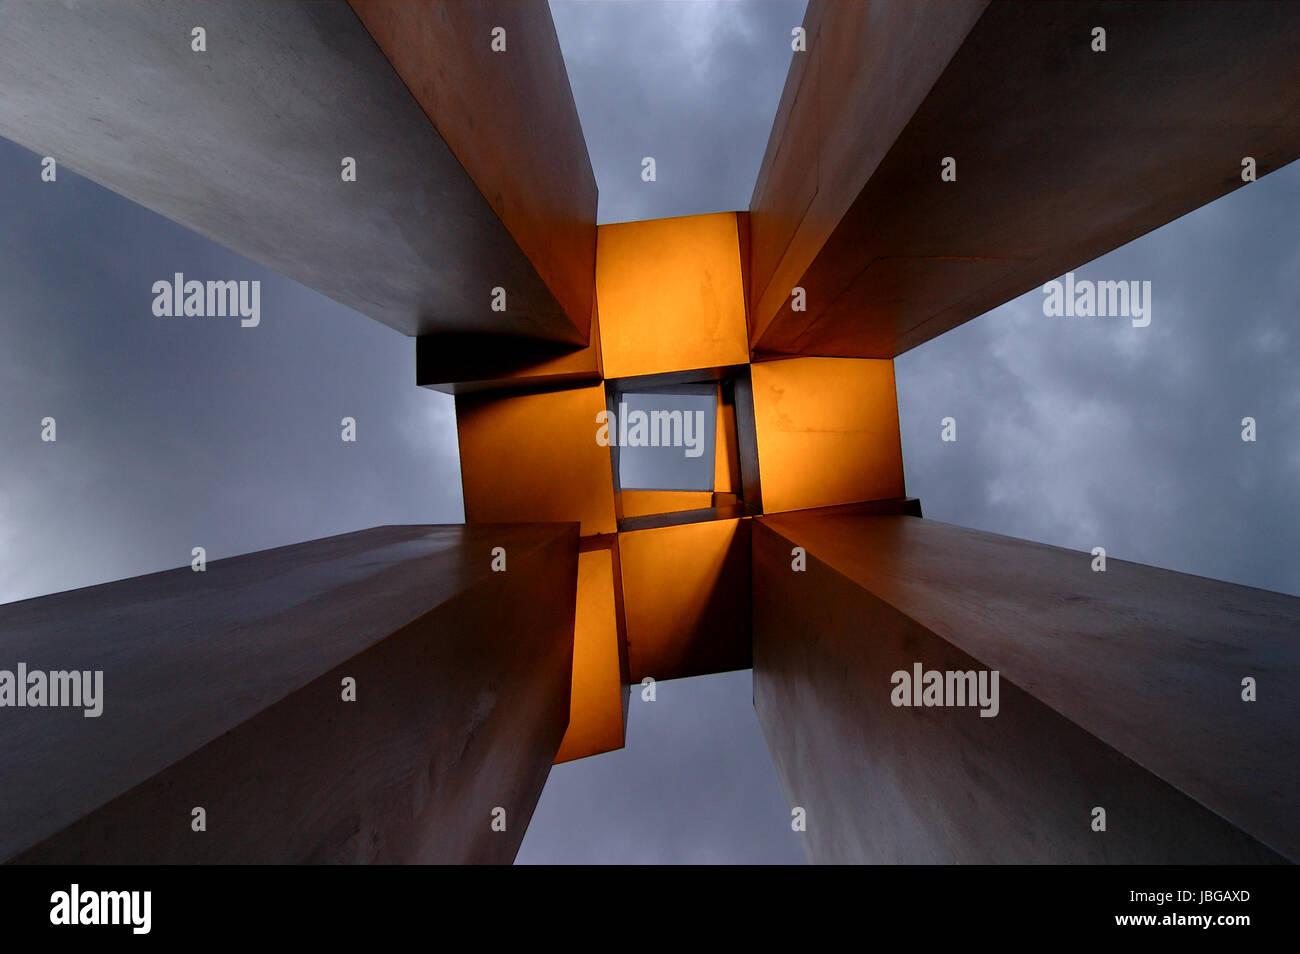 modern sculpture at night - Stock Image